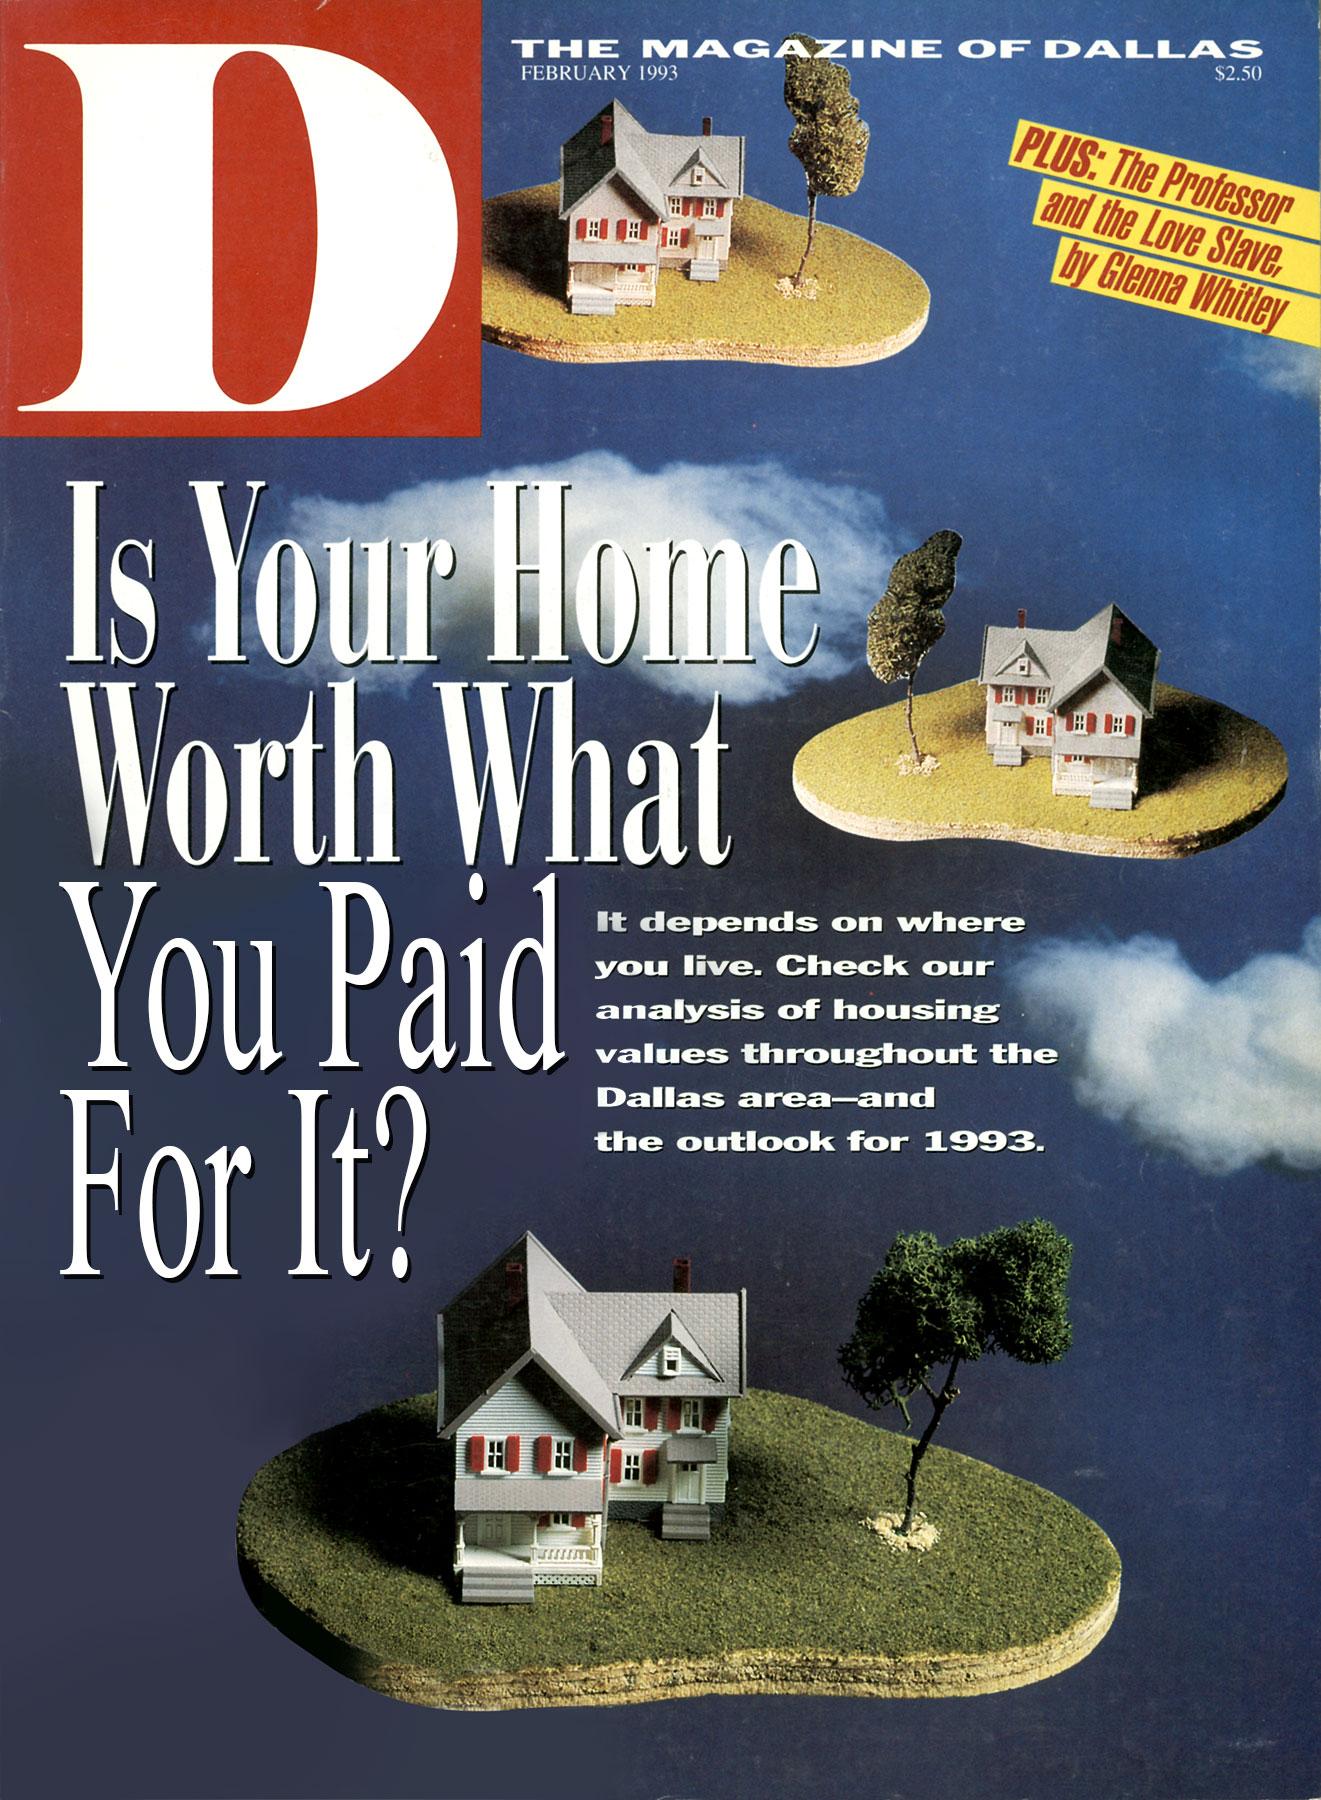 February 1993 cover